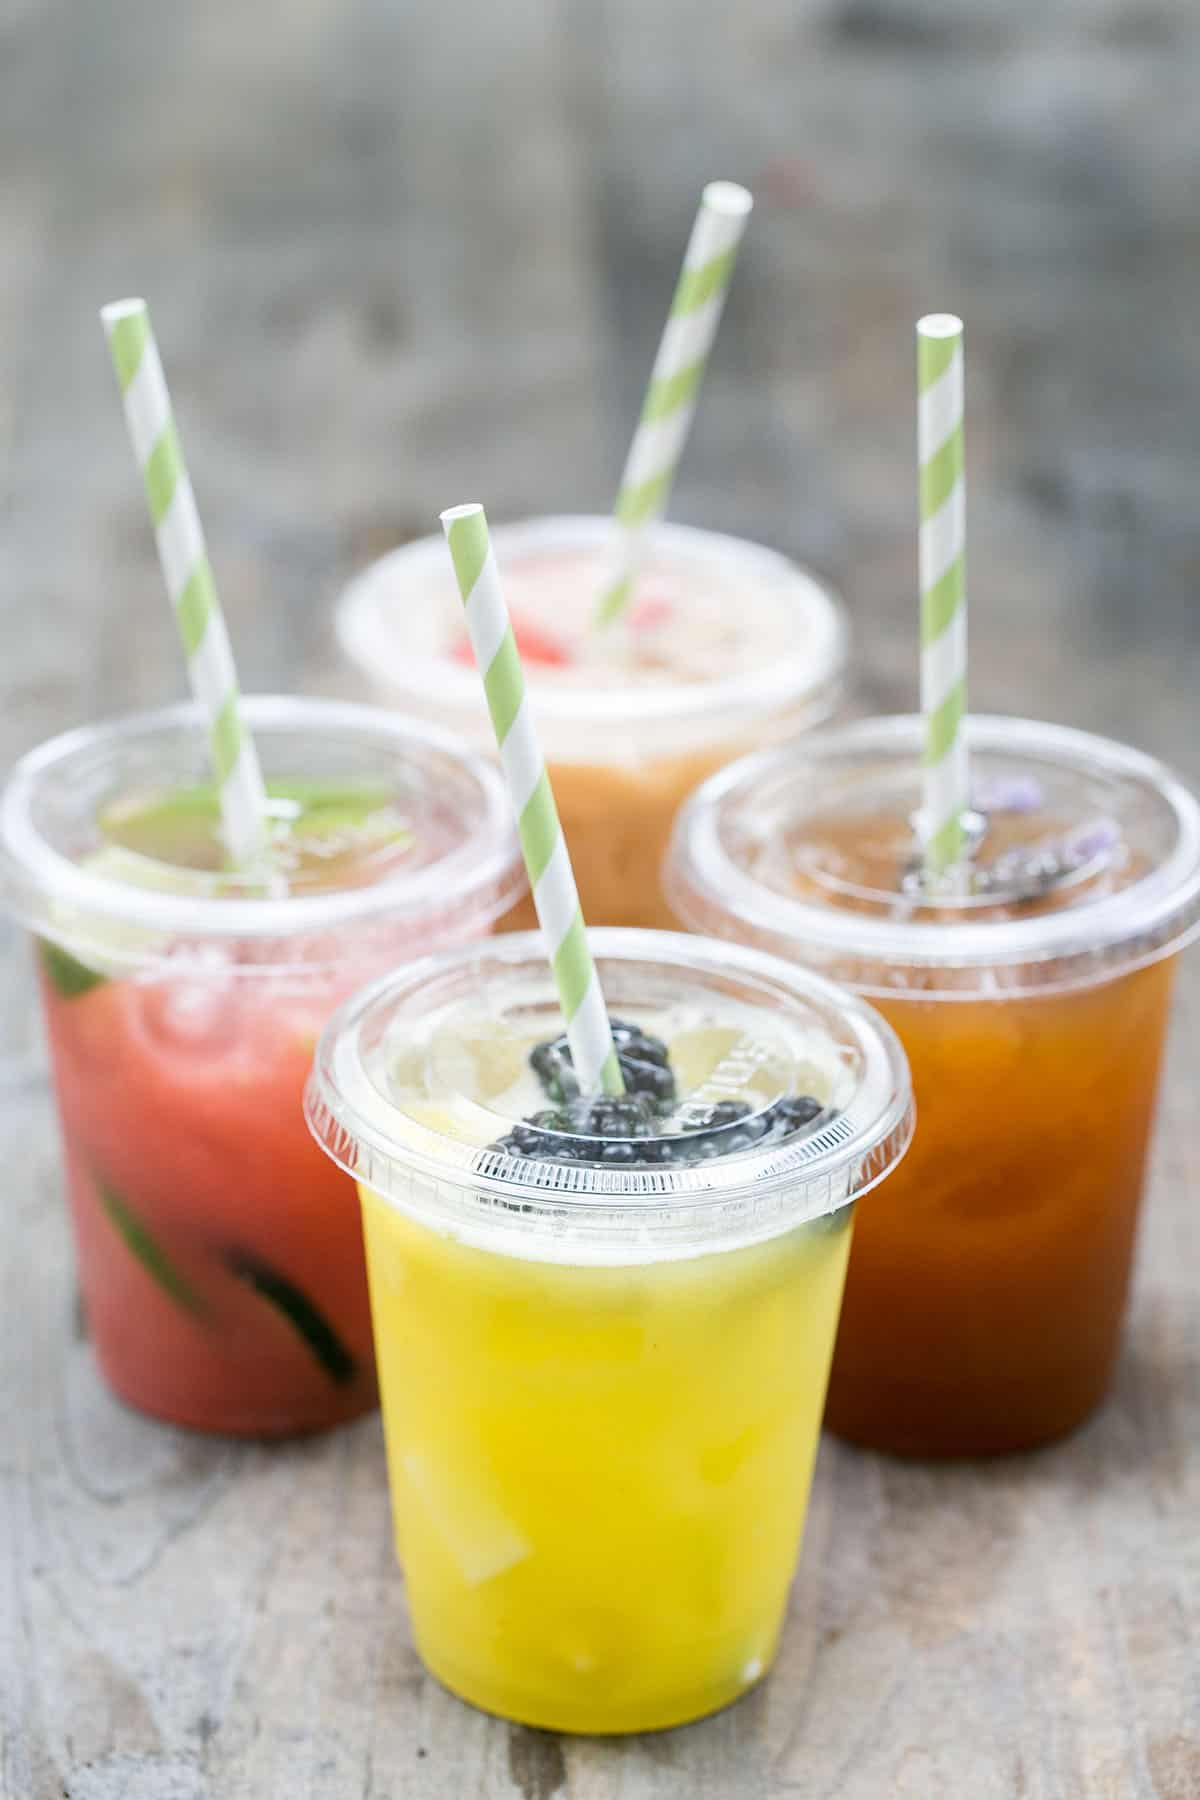 pineapple agua fresca in a cup